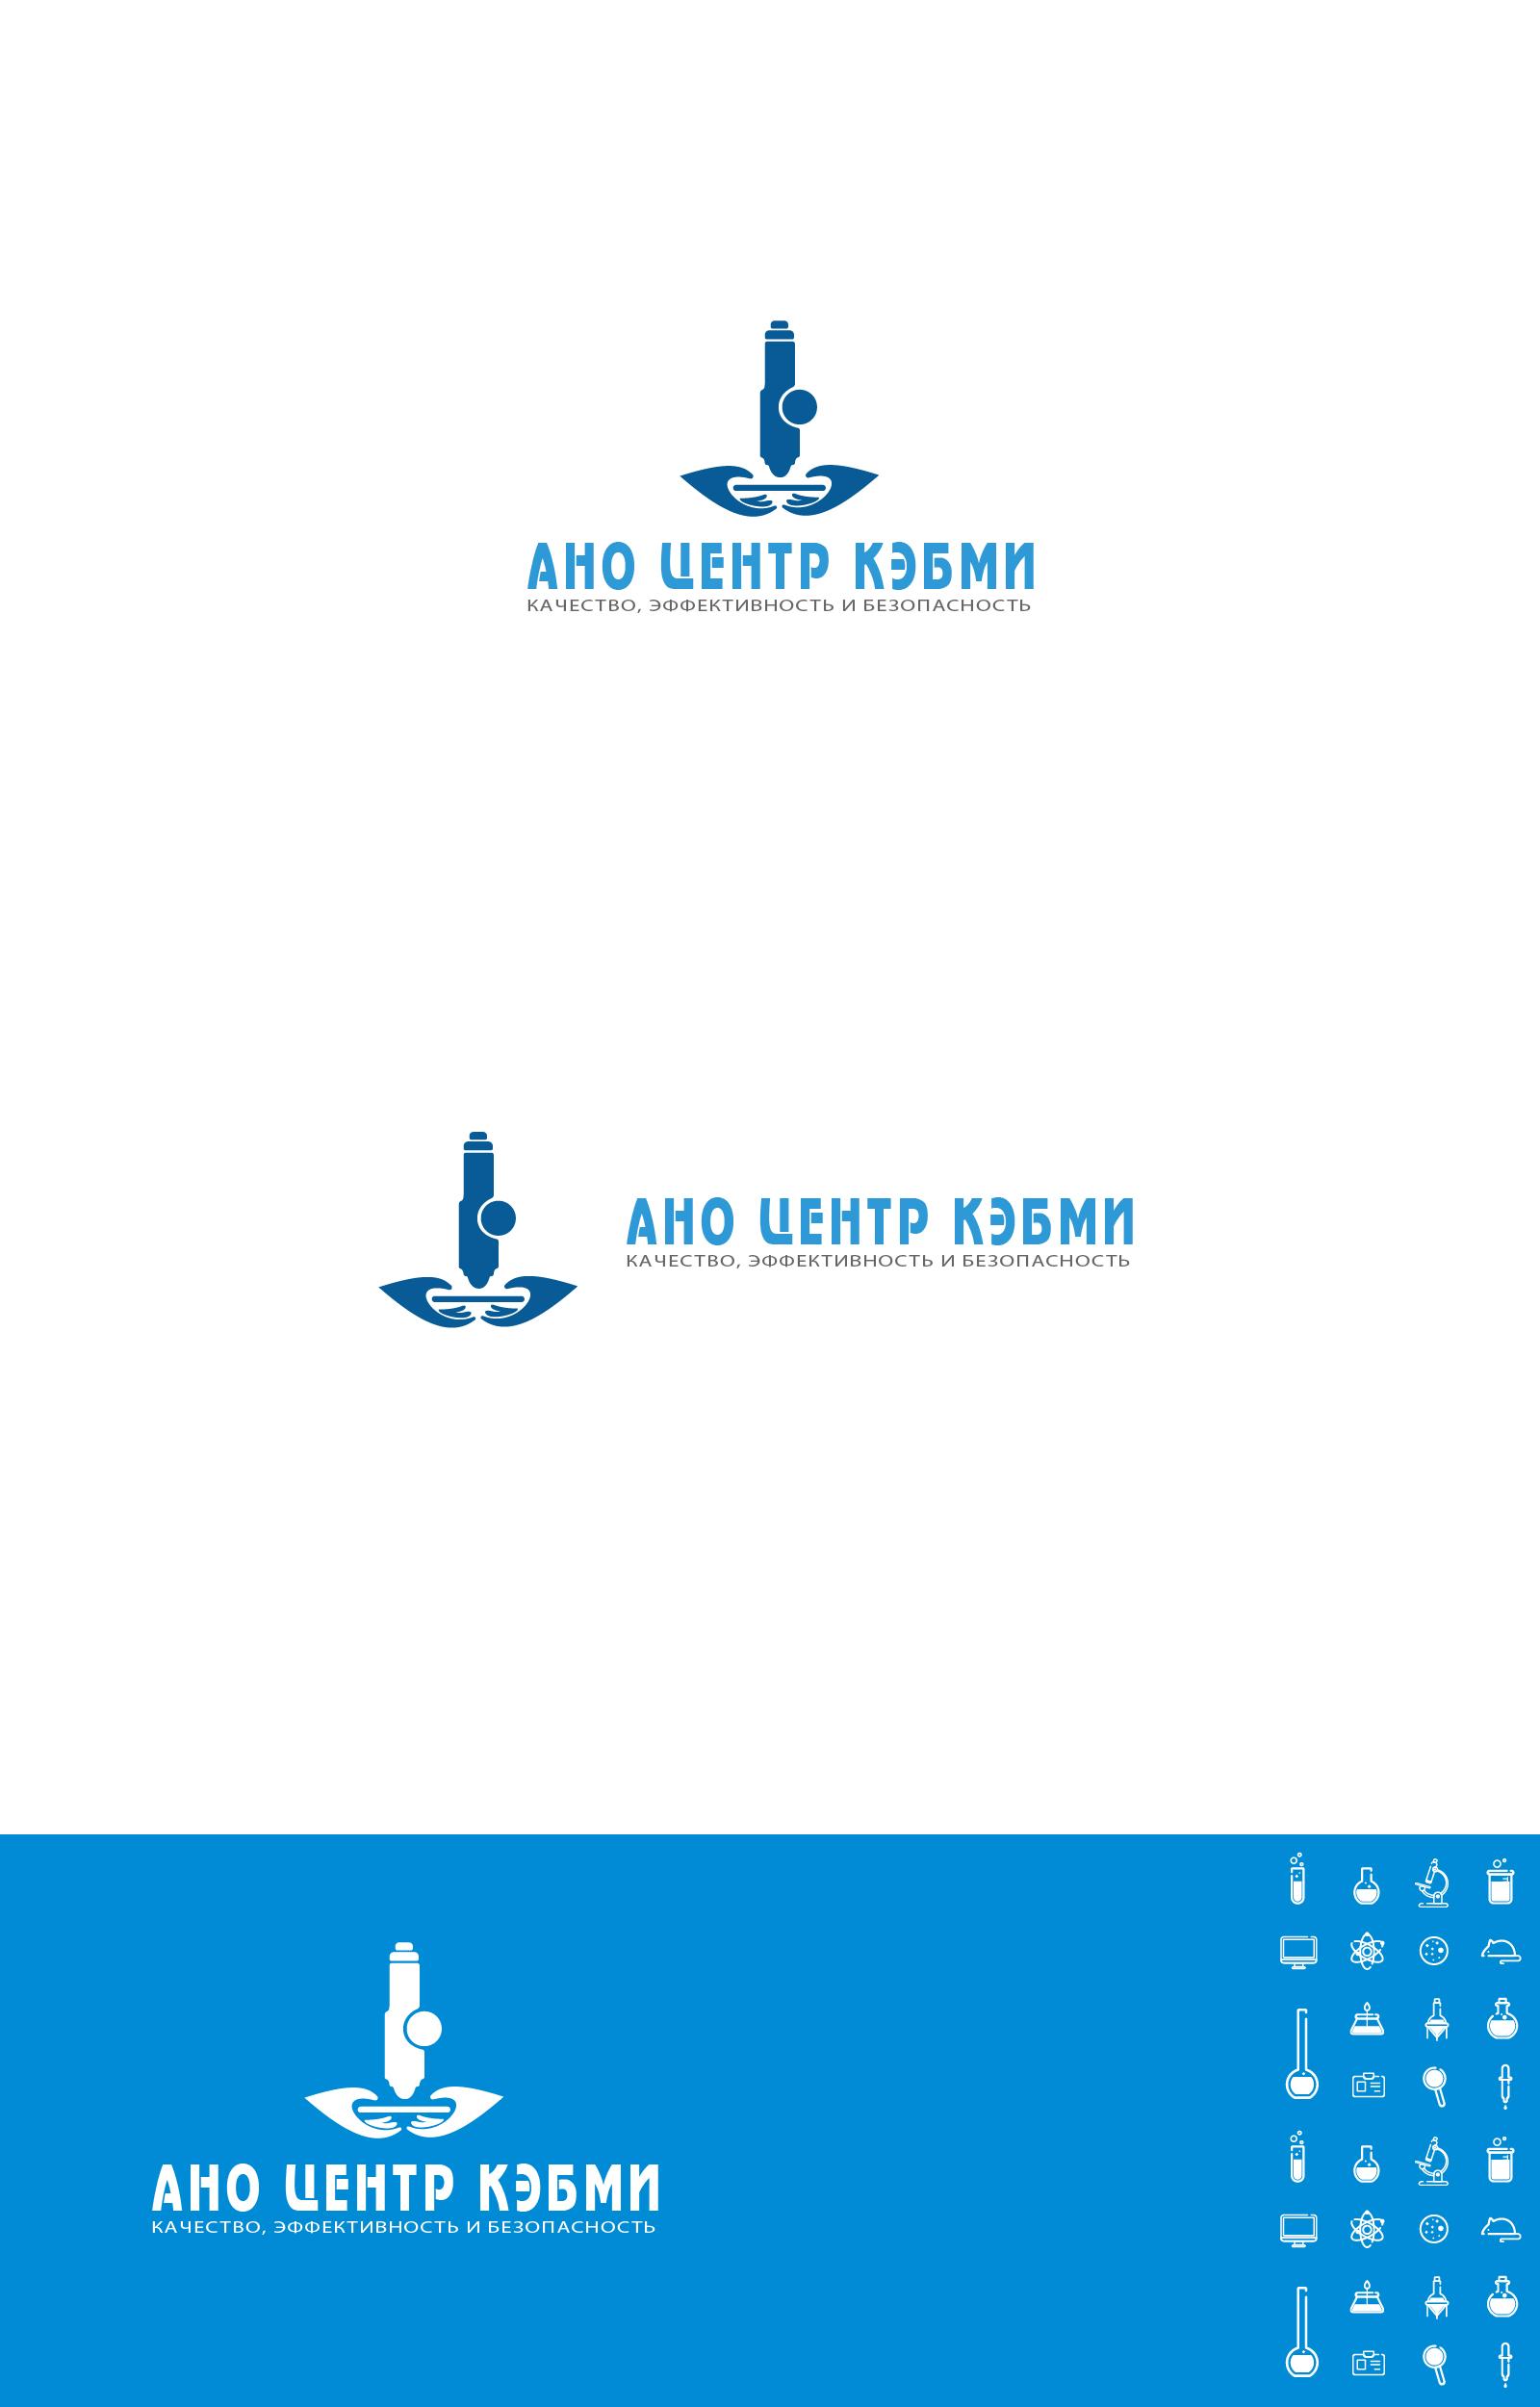 Редизайн логотипа АНО Центр КЭБМИ - BREVIS фото f_5275b1b9063497d6.jpg